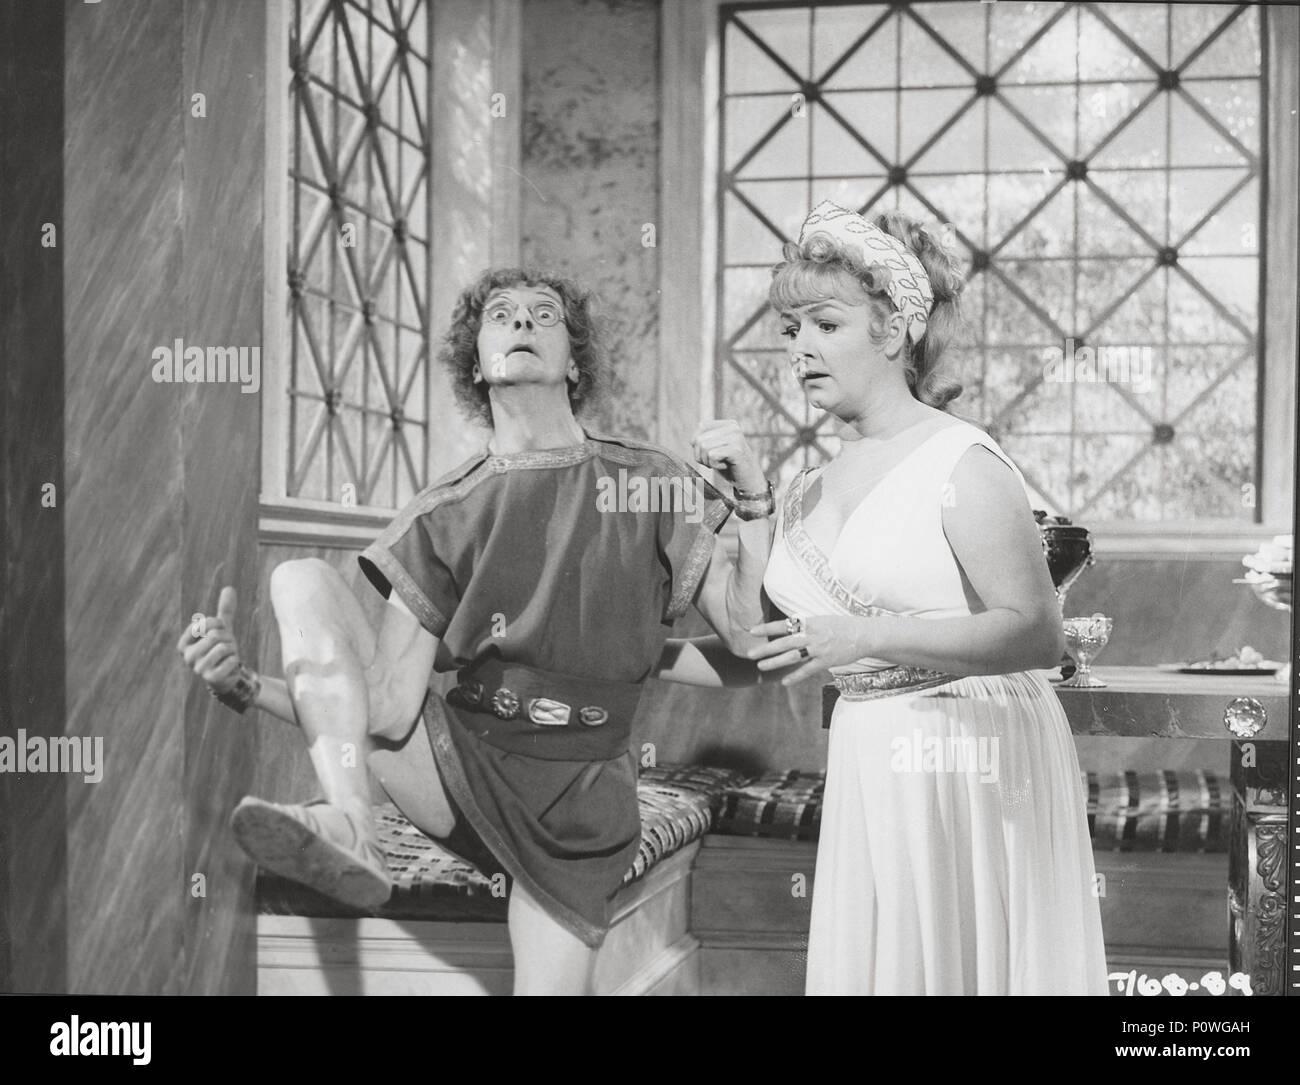 Joan Sims Nude joan sims stock photos & joan sims stock images - alamy